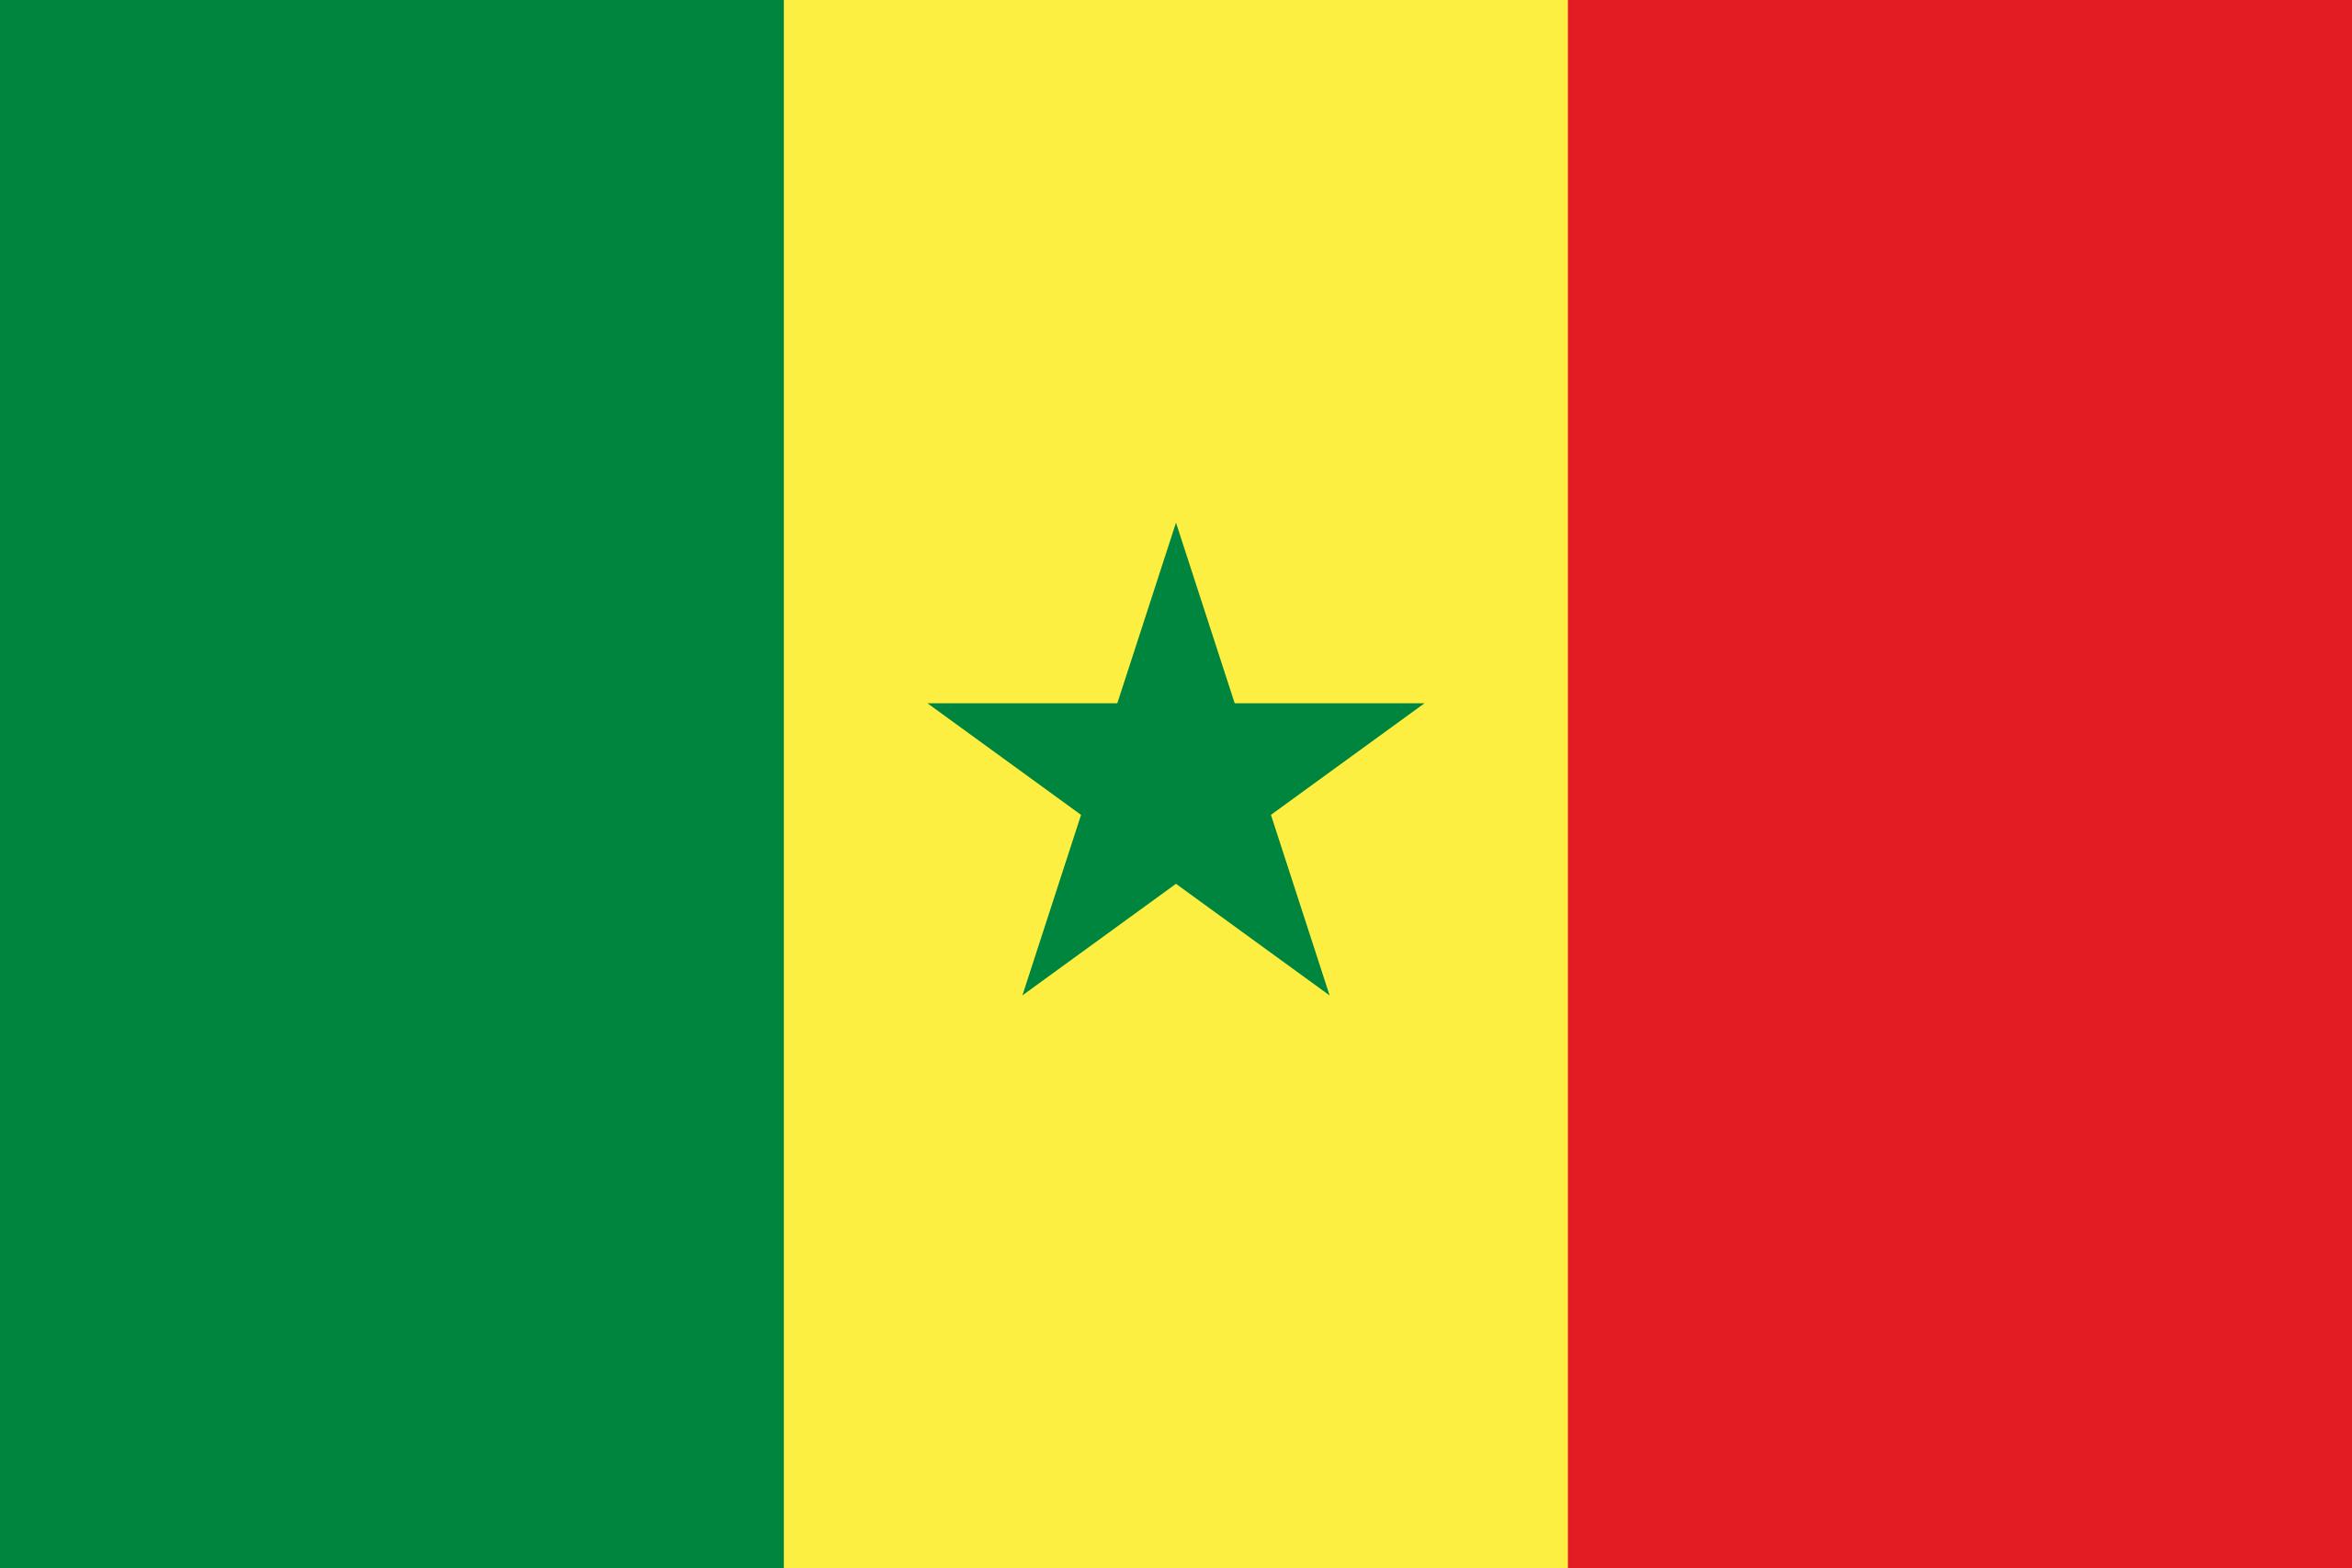 Sénégal, pays, emblème, logo, symbole - Fonds d'écran HD - Professor-falken.com